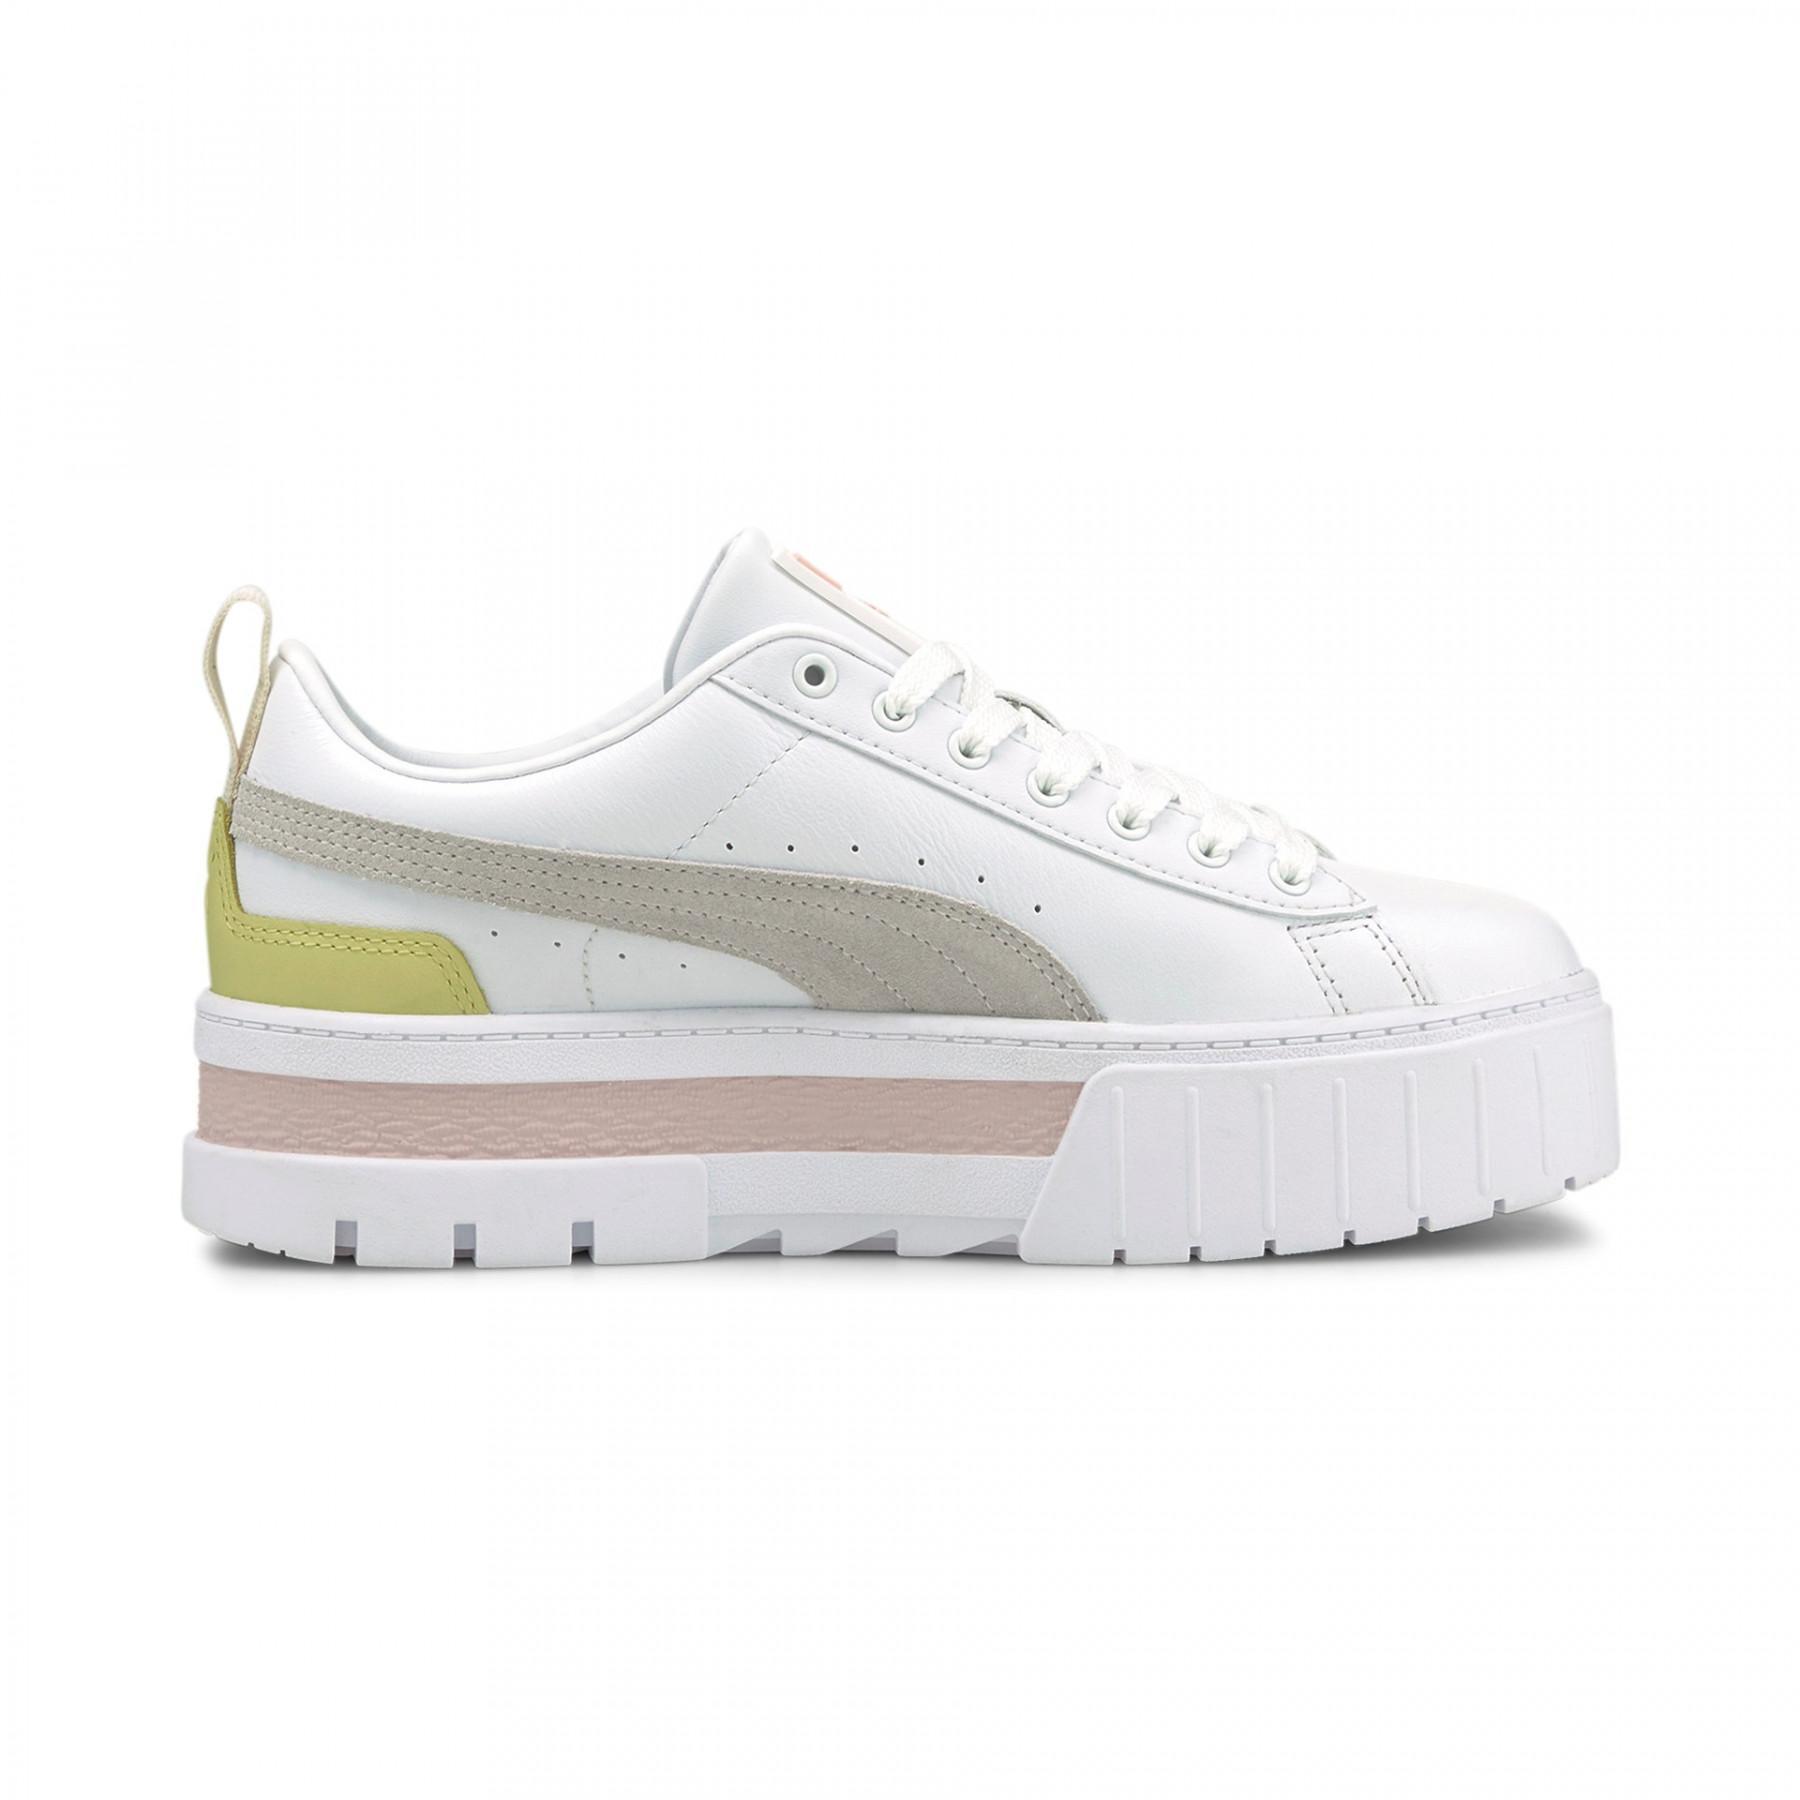 Women's sneakers Puma Mayze Wn's